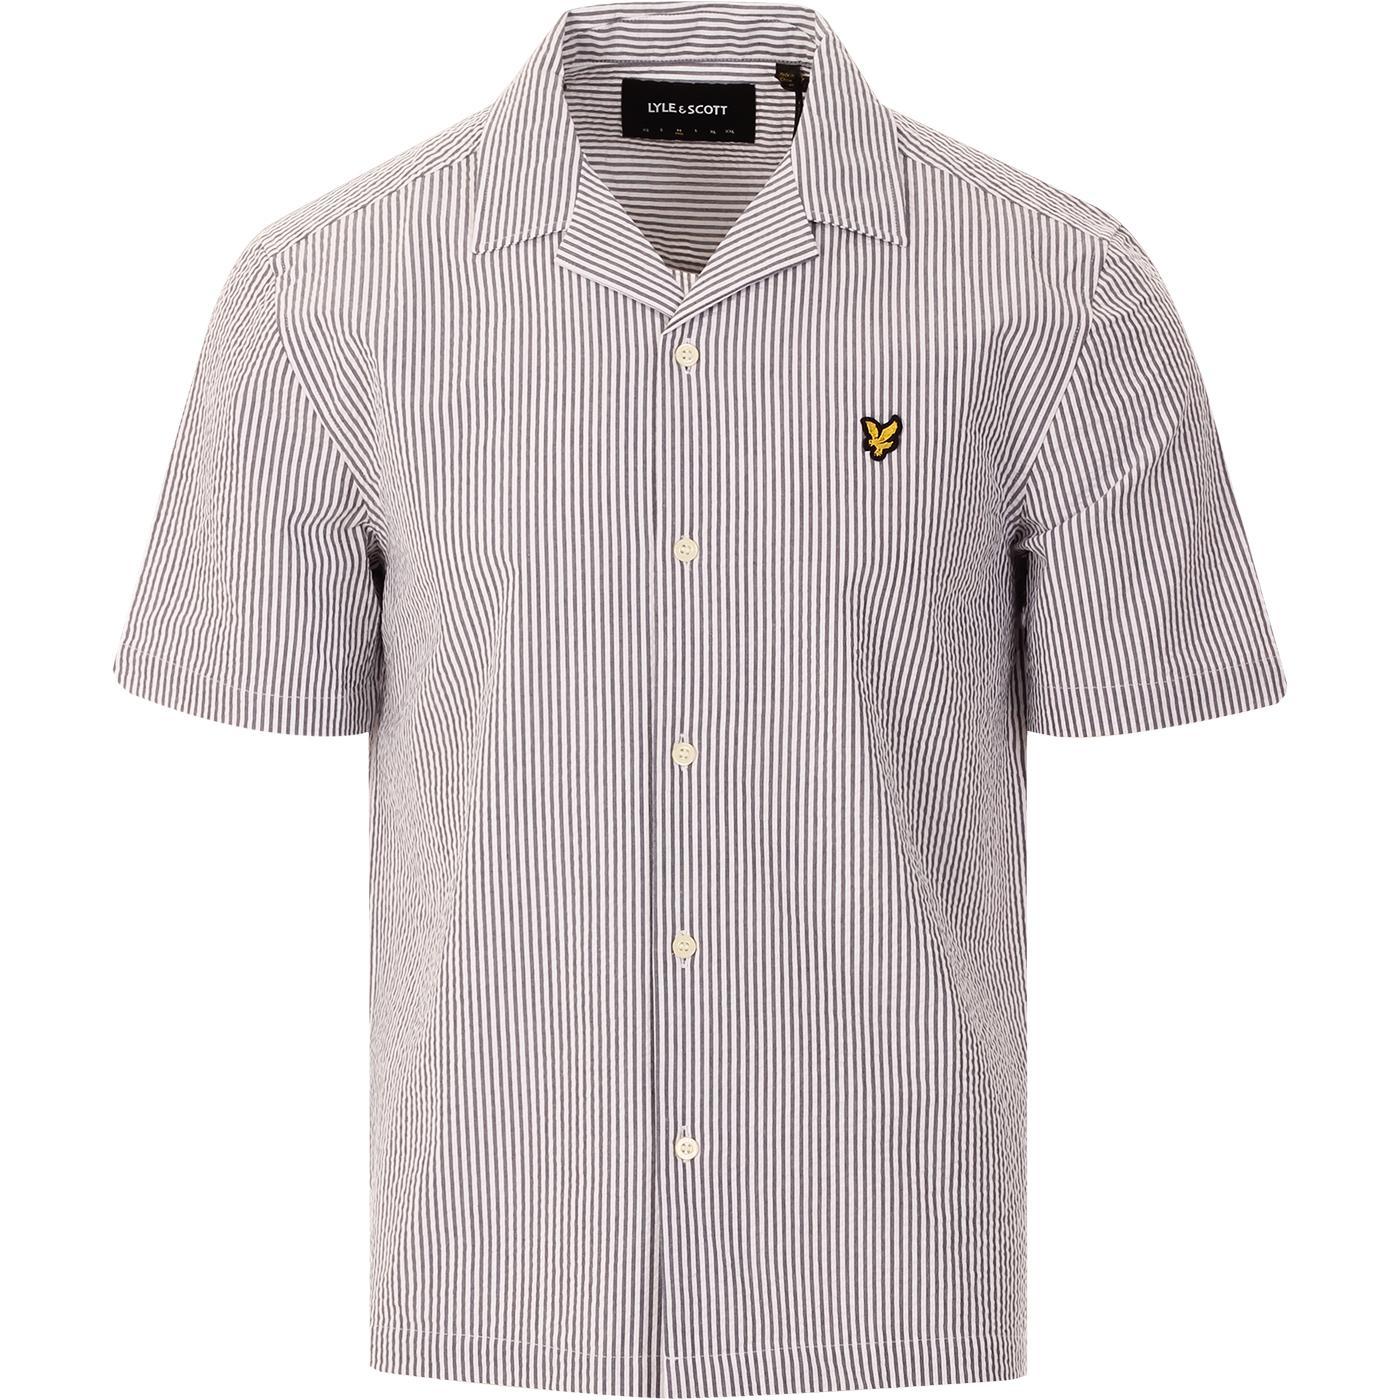 LYLE & SCOTT Retro 50s Seersucker Resort Shirt (N)